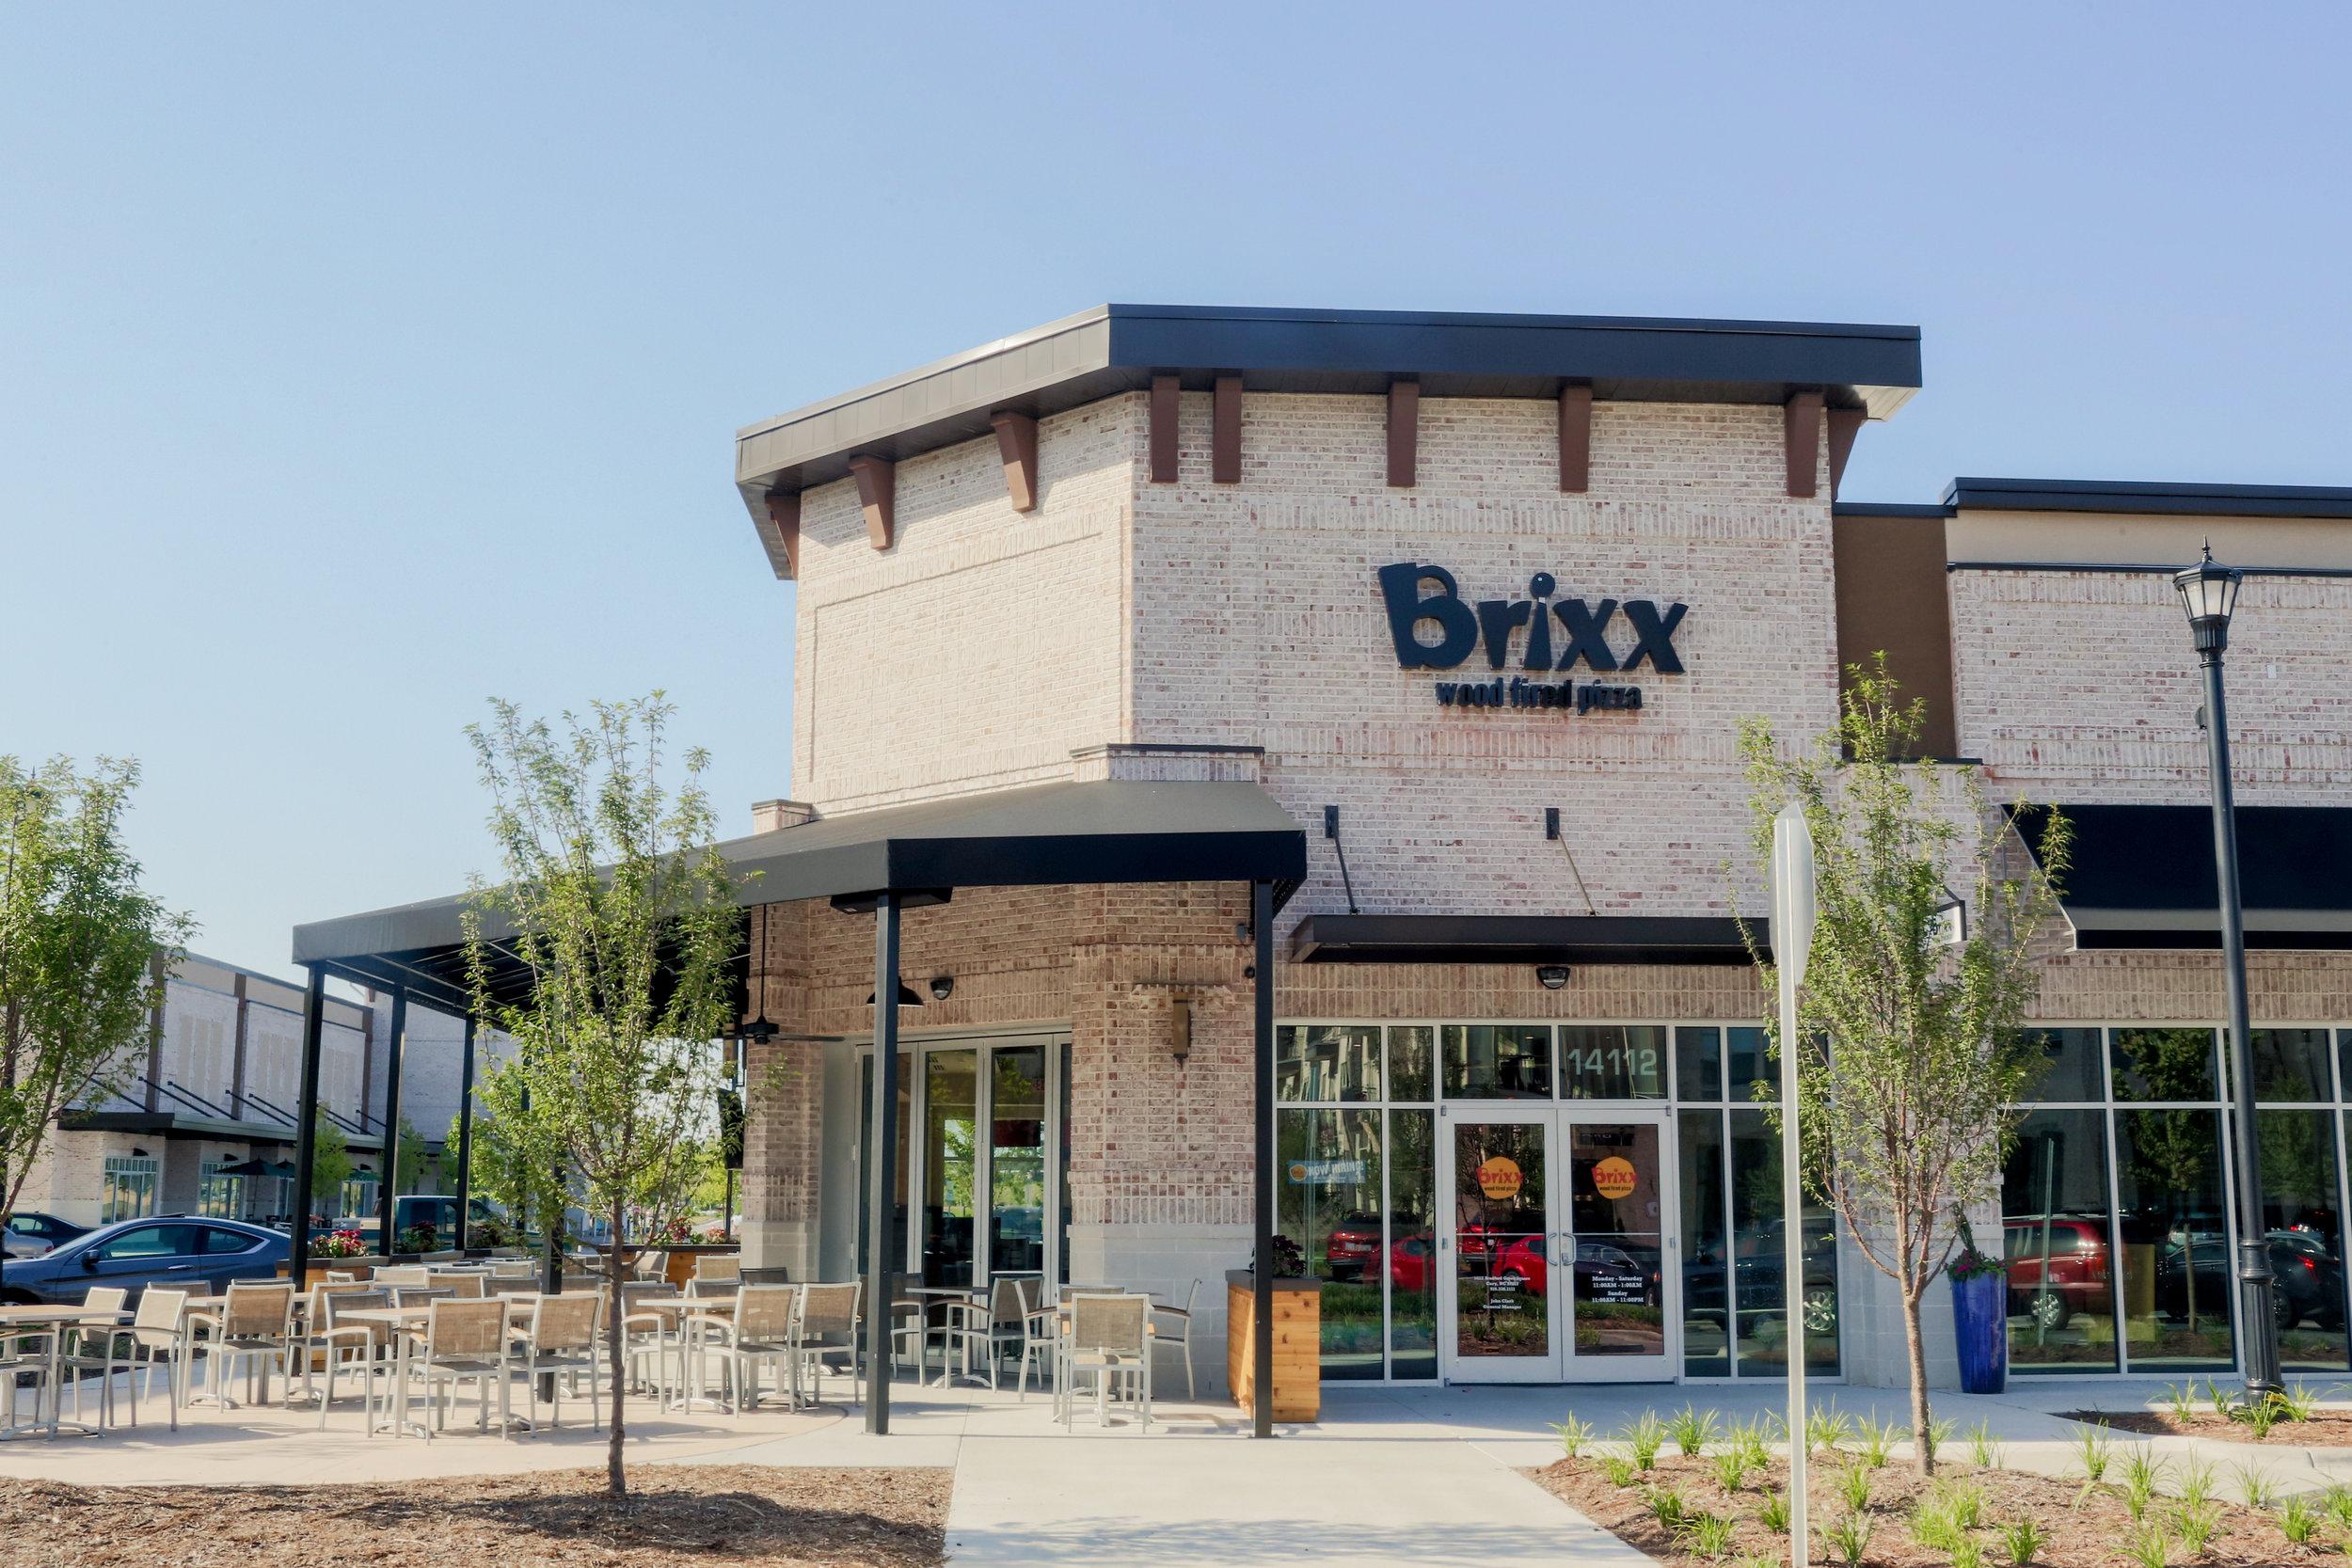 ADW-Restaurant-Brixx-Wood-Fired-Pizza-Cary-NC-Exterior.JPG